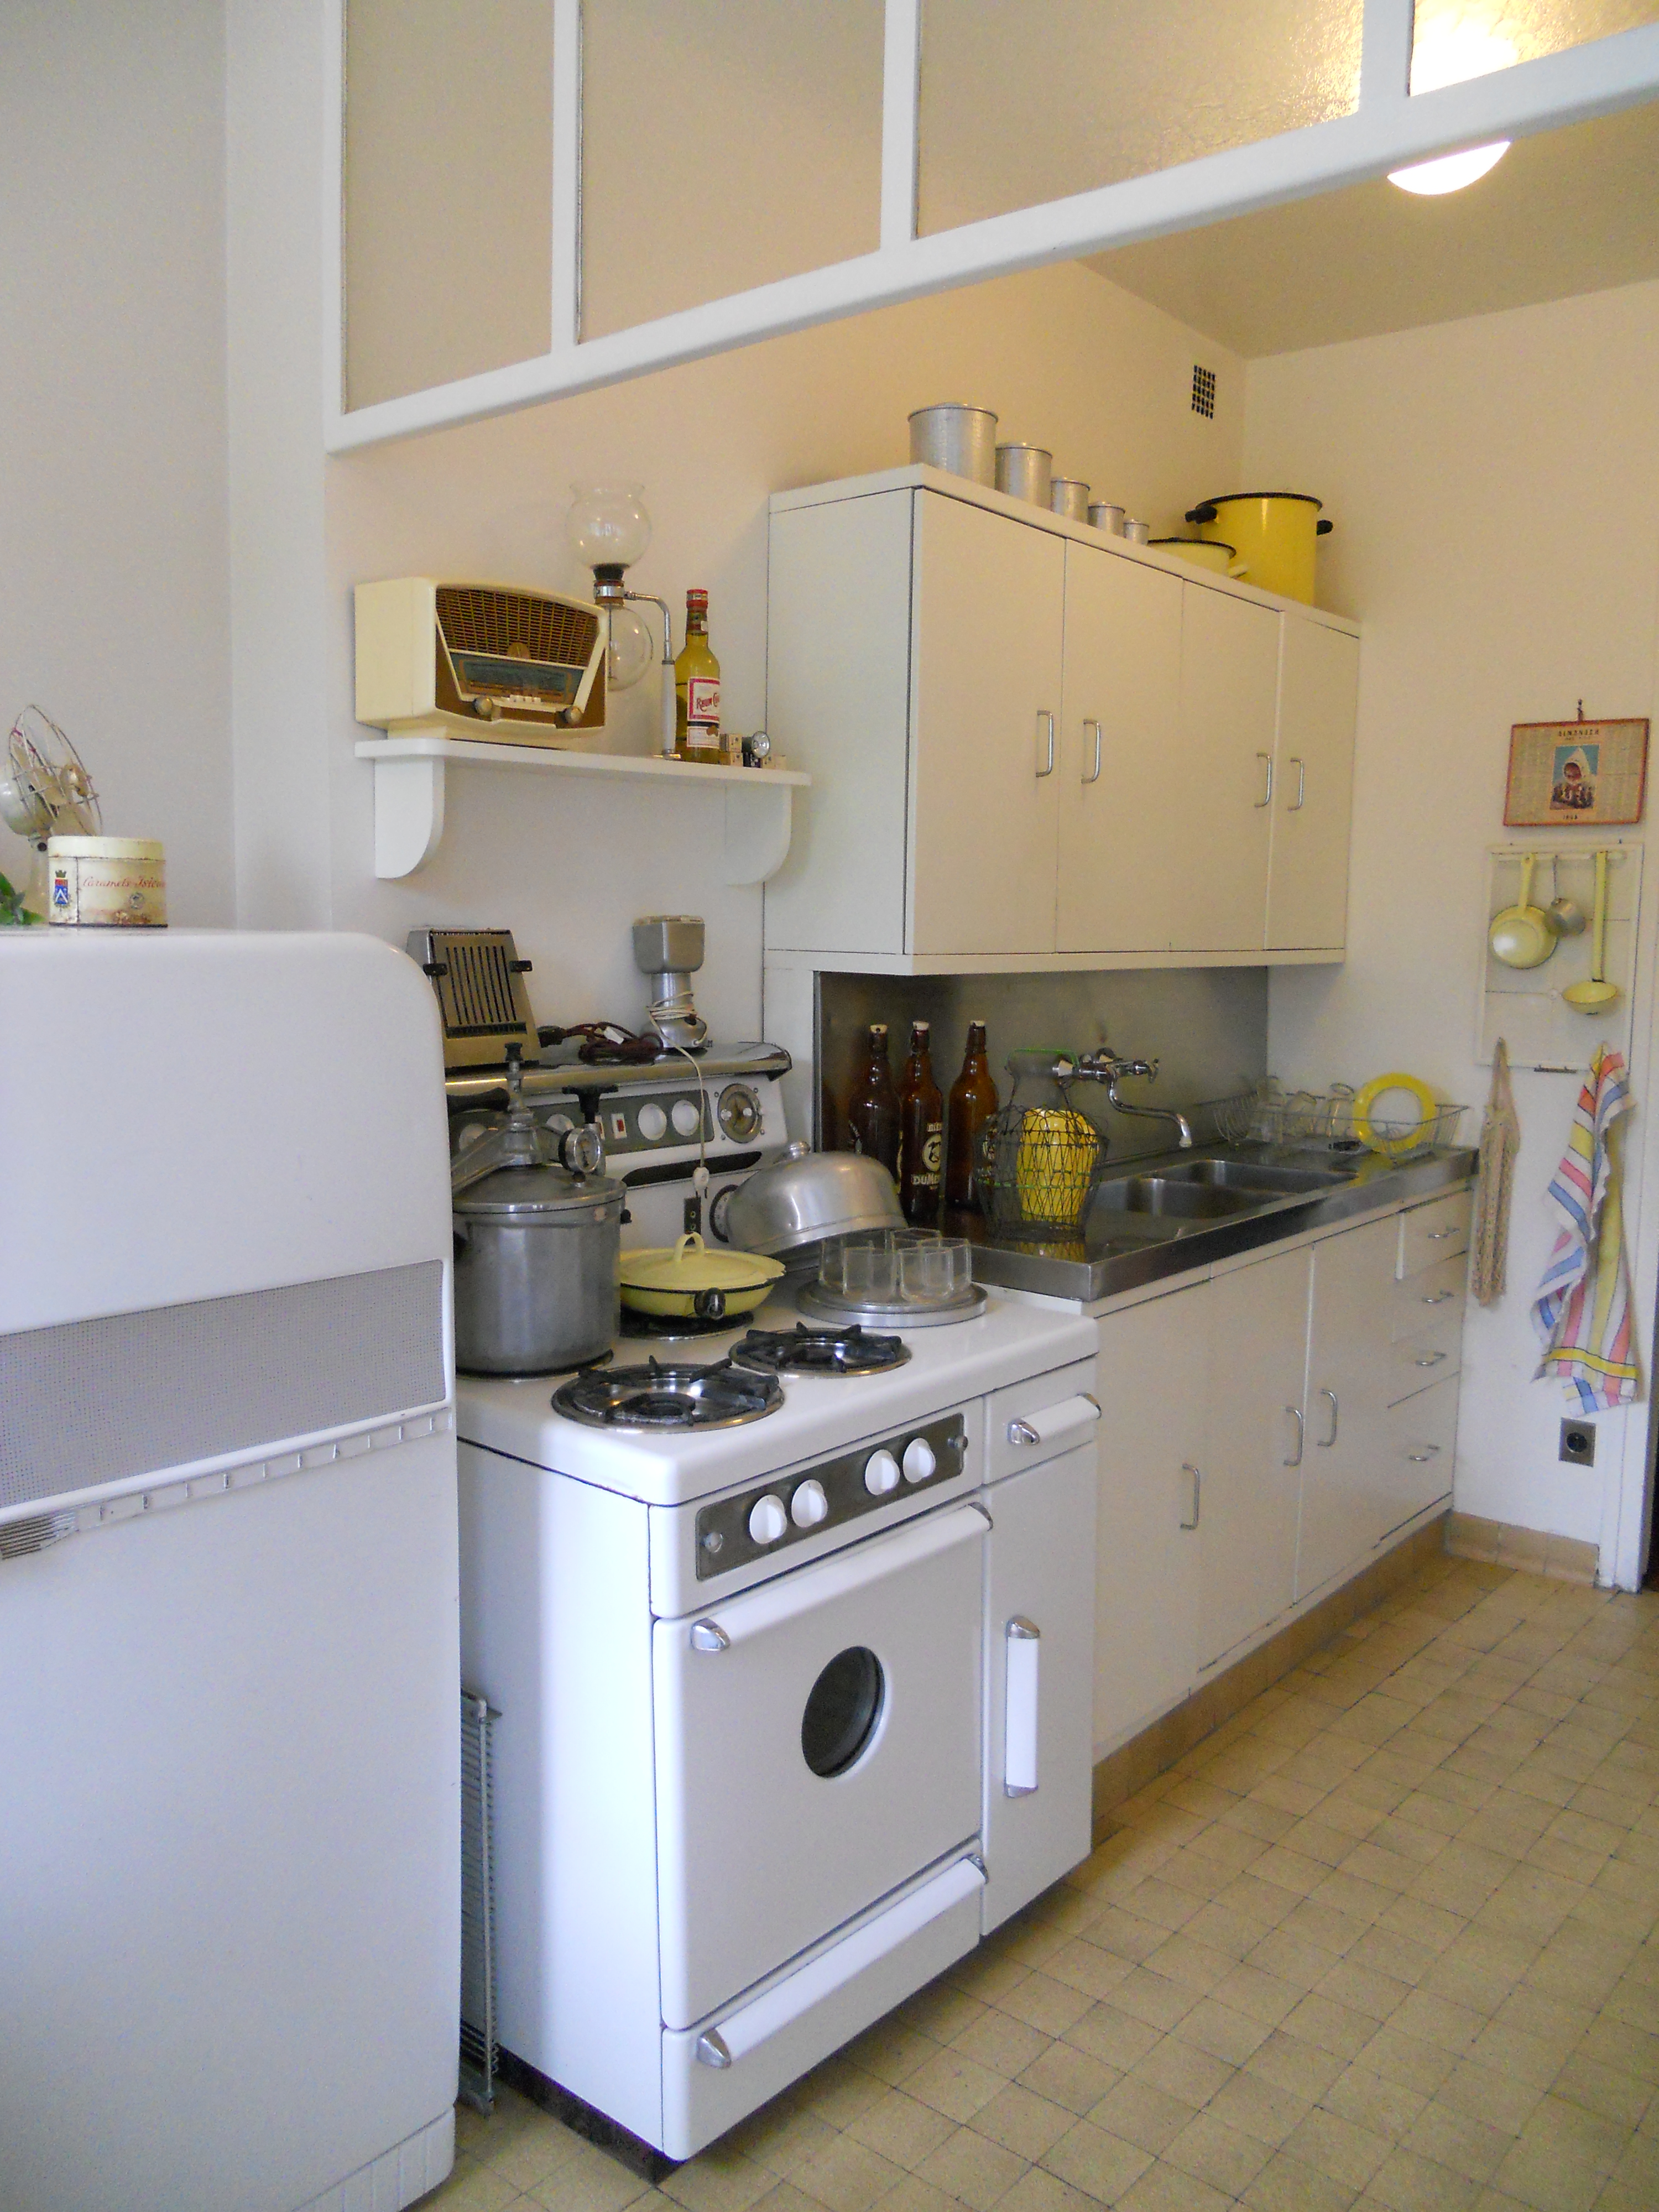 file cuisine de l 39 appartement t moin perret au havre jpg. Black Bedroom Furniture Sets. Home Design Ideas